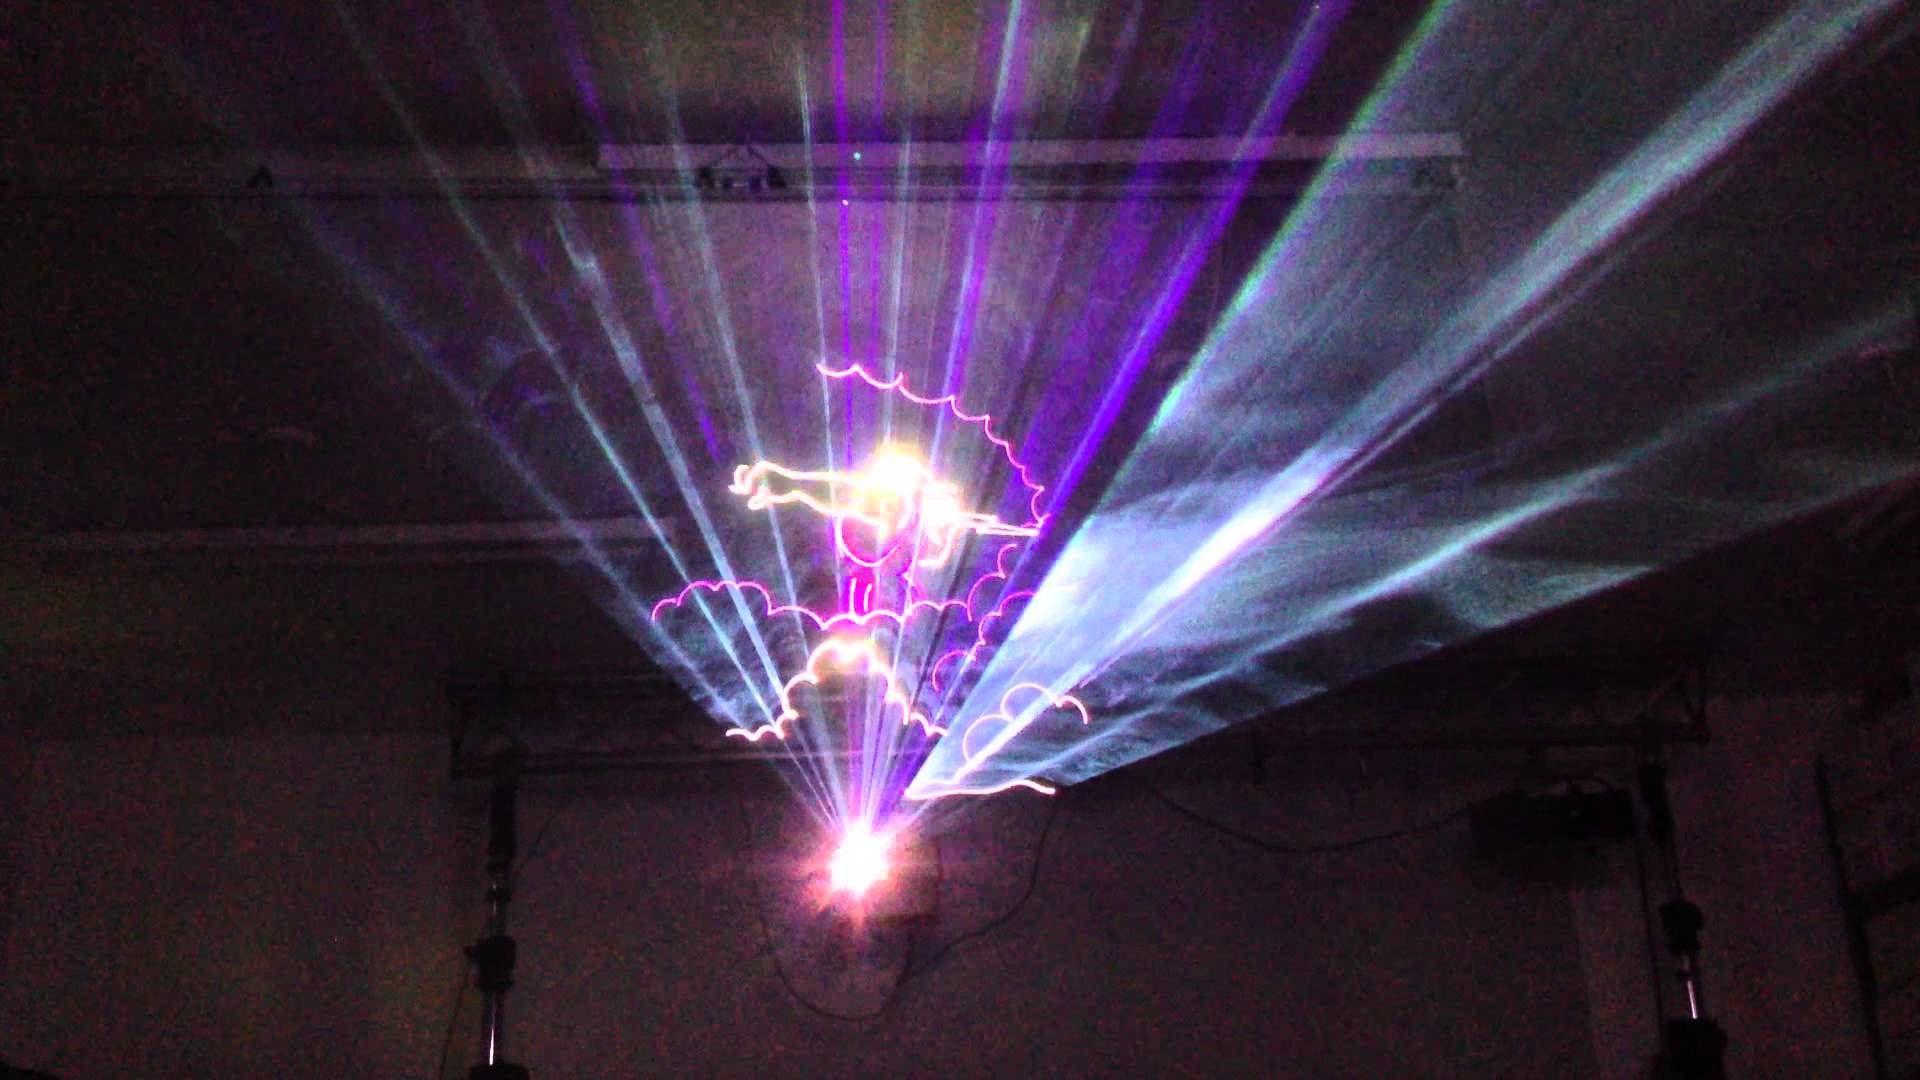 nrg 3000 rgb mini pro ilda 30k laser light projector. Black Bedroom Furniture Sets. Home Design Ideas